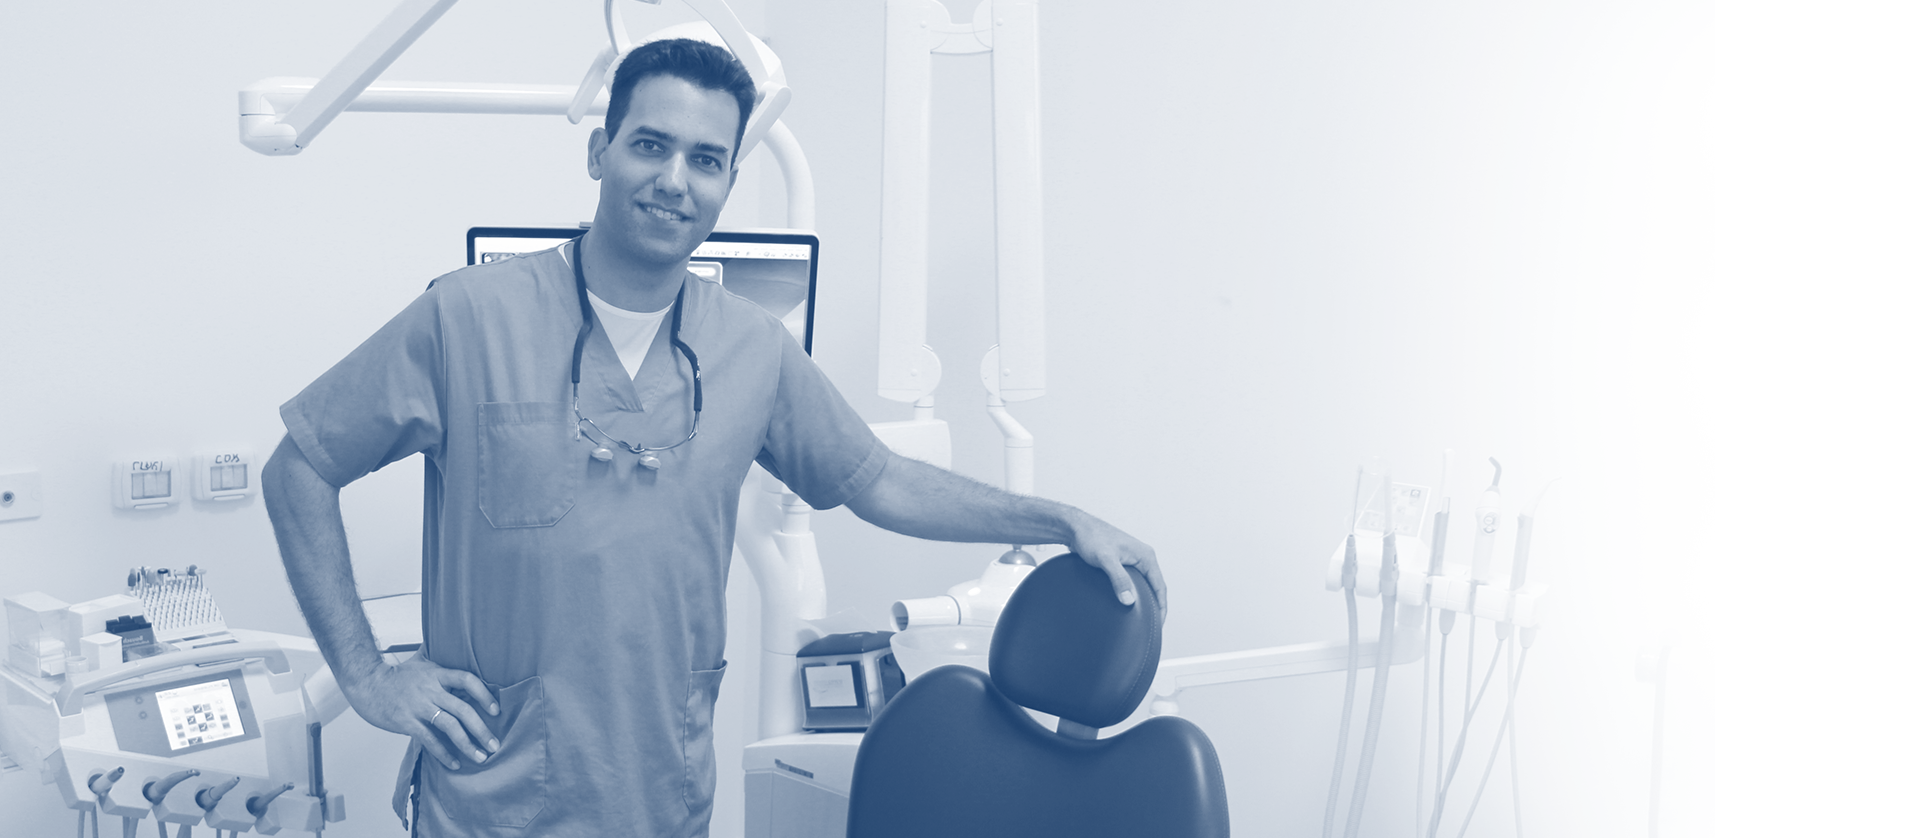 Orthodontist Moddin and Ashdod